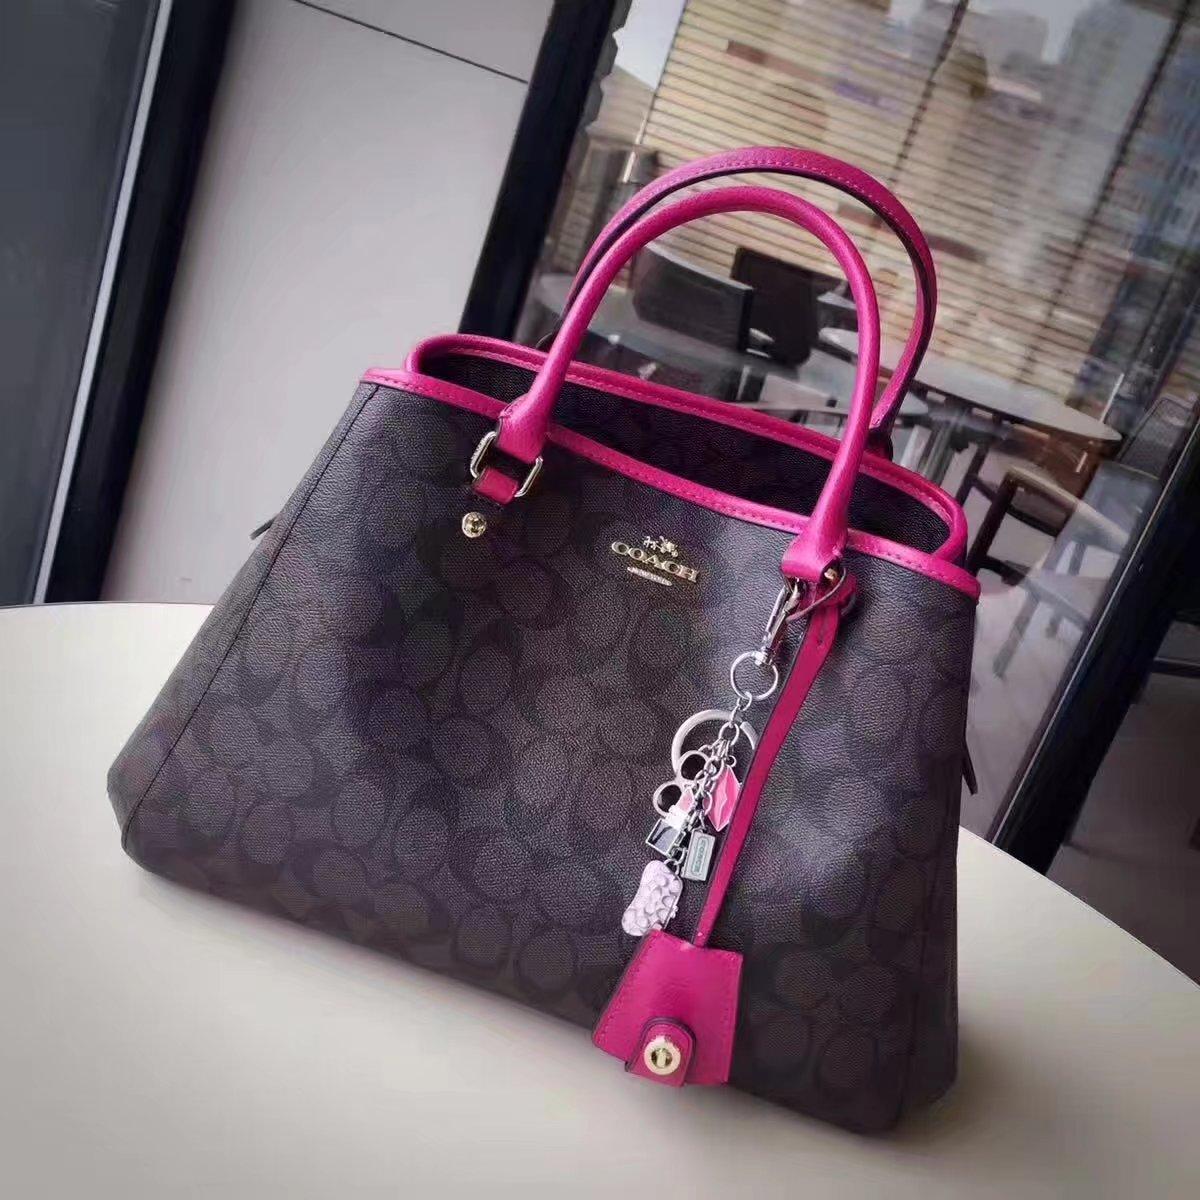 Coach 34608 Women Tote Bag in Signature Jacquard Pink